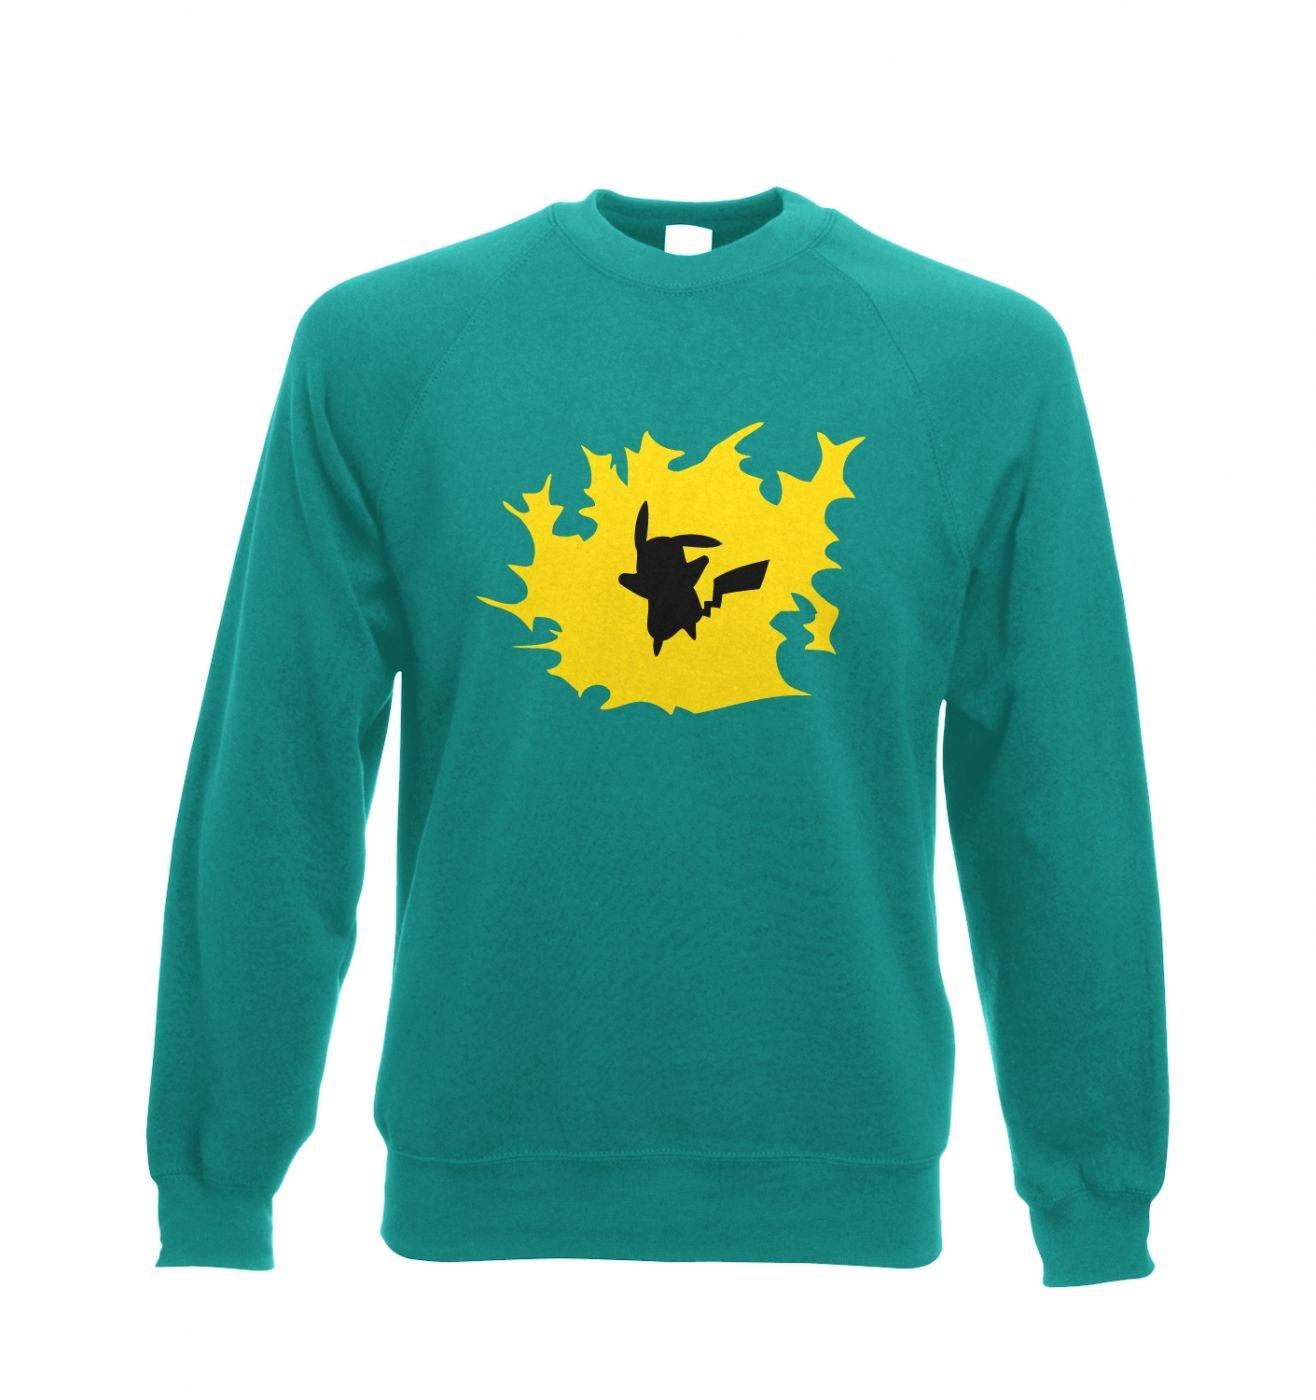 Yellow Pikachu Silhouette Adult Crewneck Sweatshirt  - Inspired by Pokemon